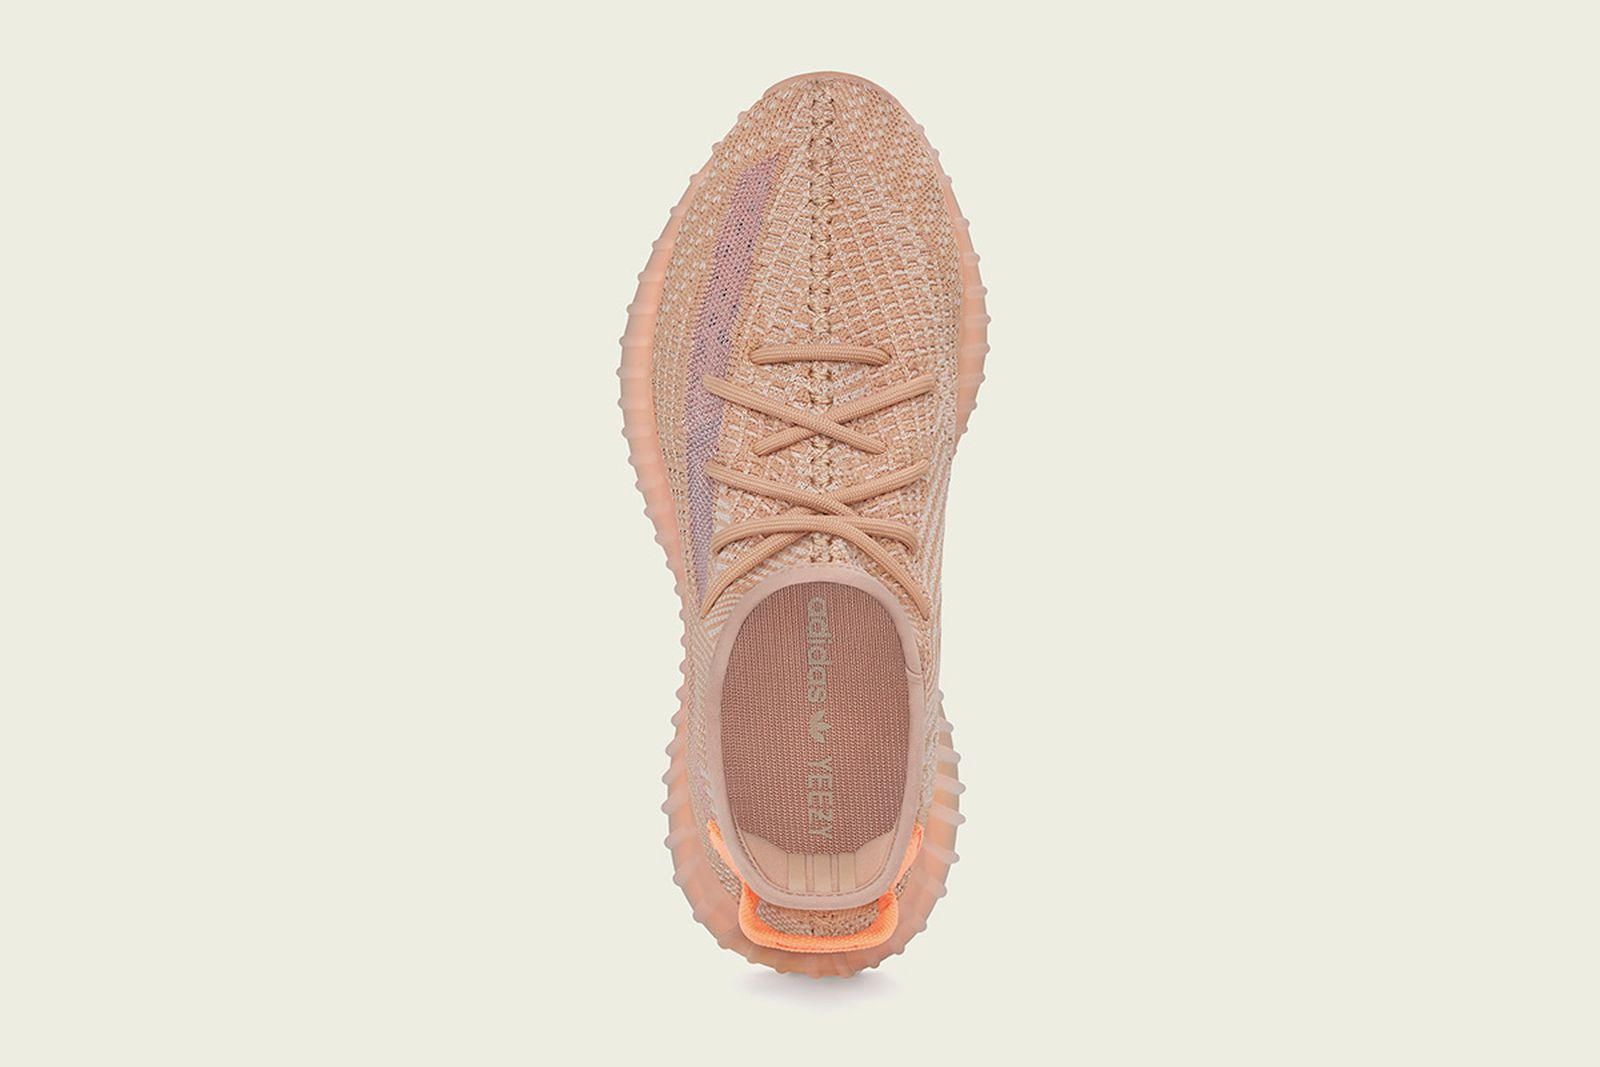 adidas originals yeezy boost 350 v2 clay release date price adiads originals yeezy boost 350 v2